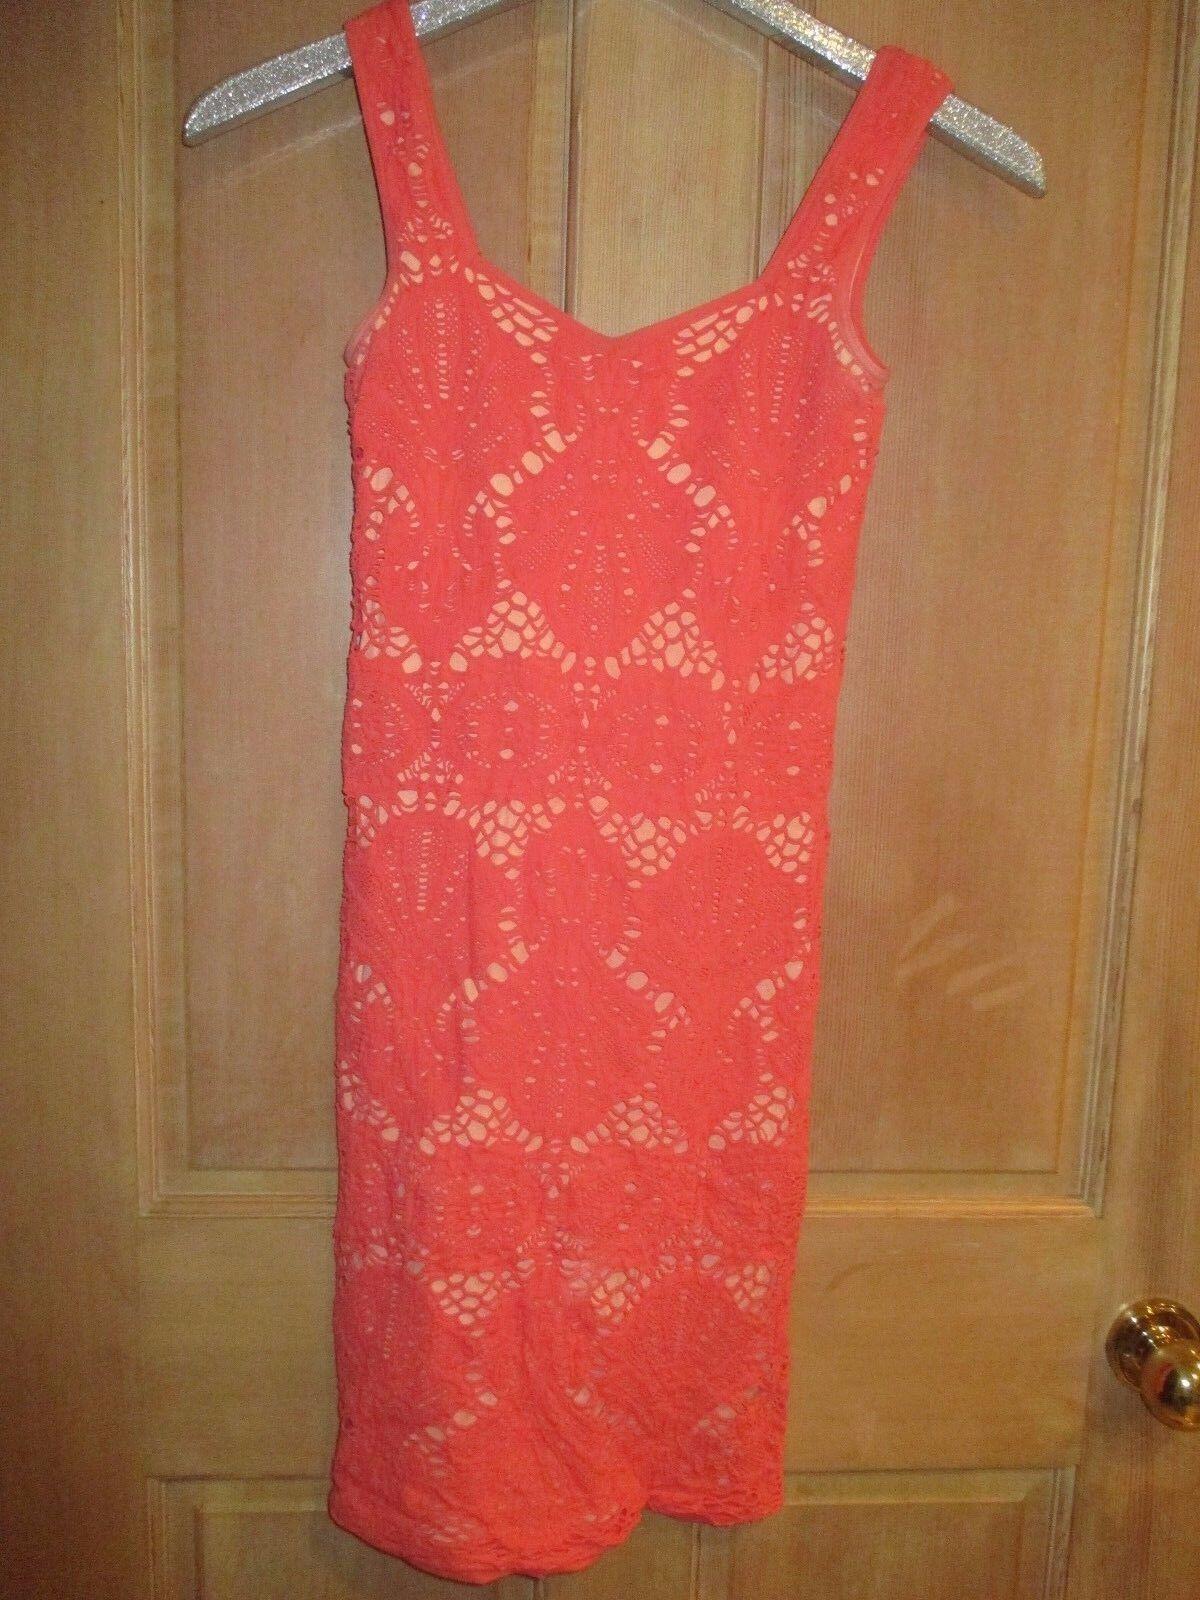 EUC  Free People MINI DRESS TOP TUNIC SHIRT M L Bodycon Clubwear Peach Coral